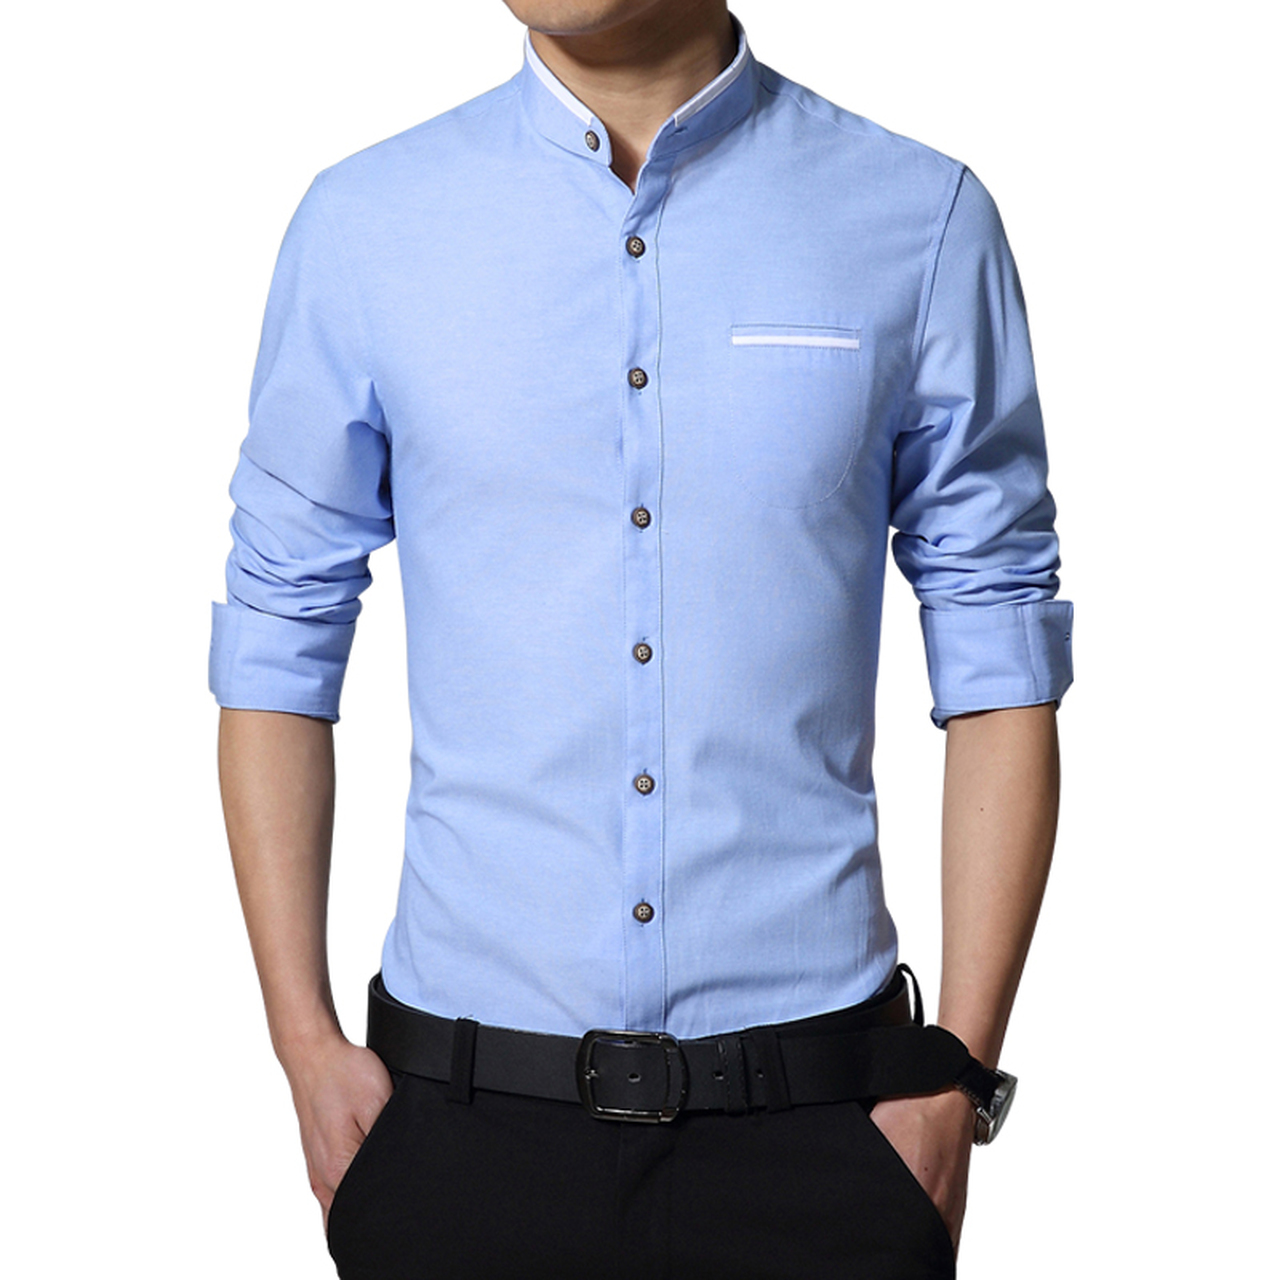 Mens Dress Shirt M Formal Shirts